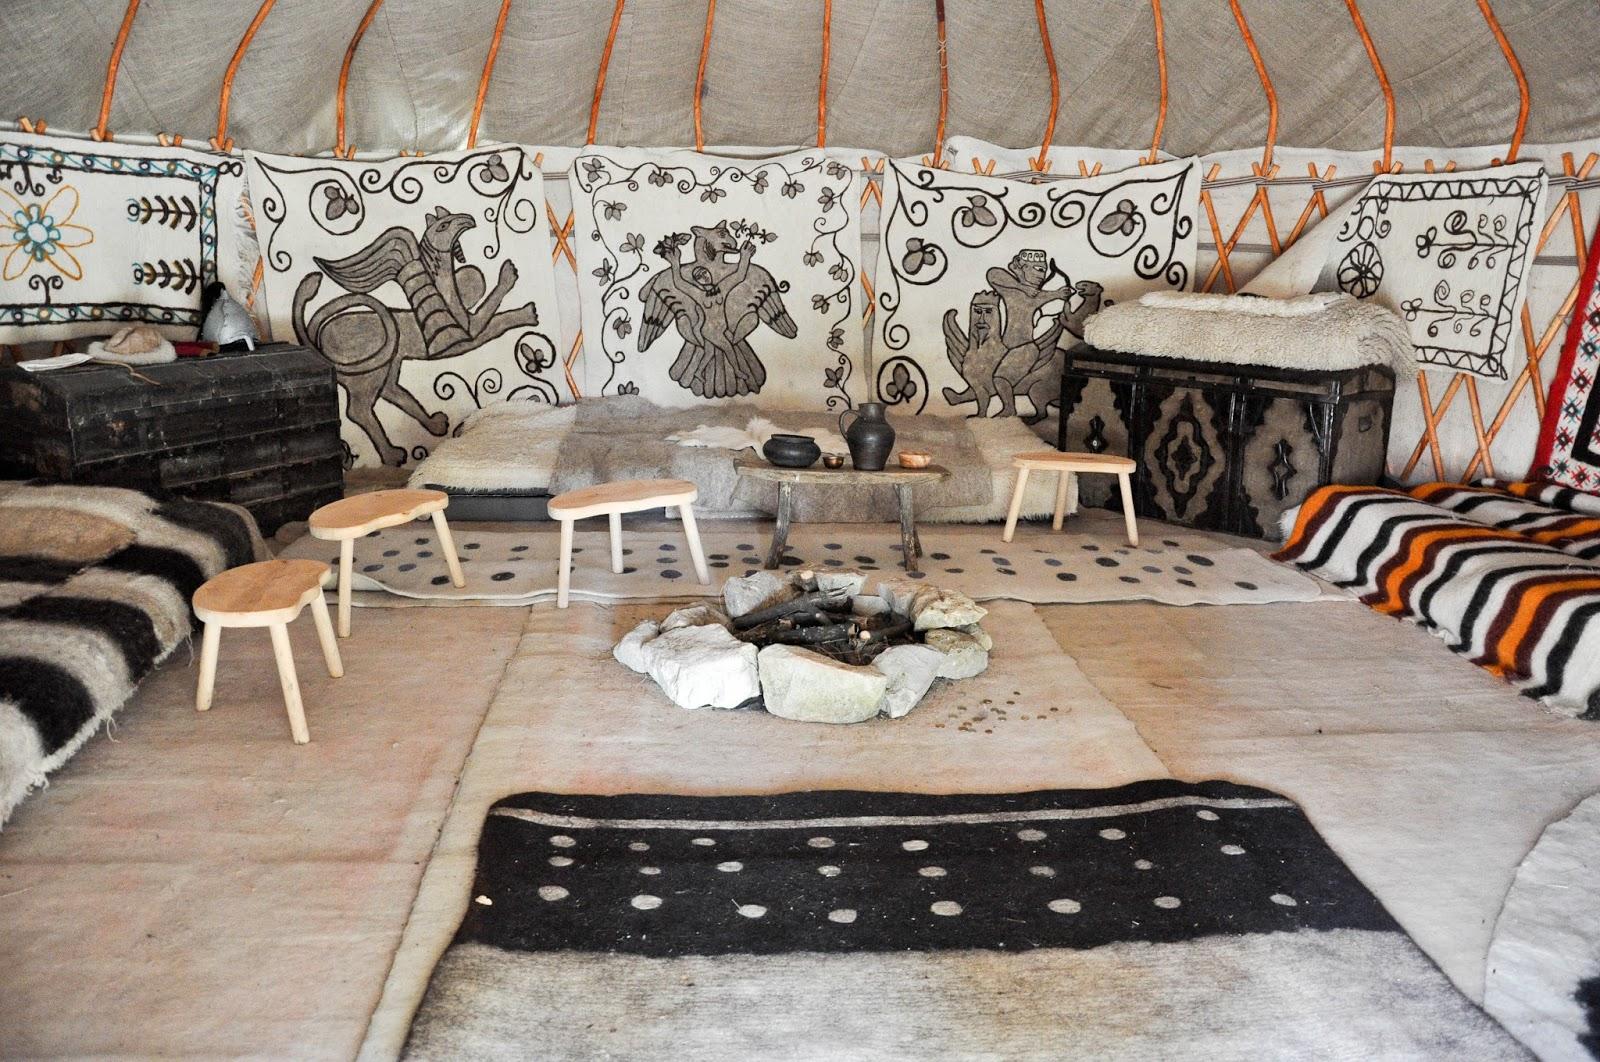 Inside the yurt, Pliska, Bulgaria